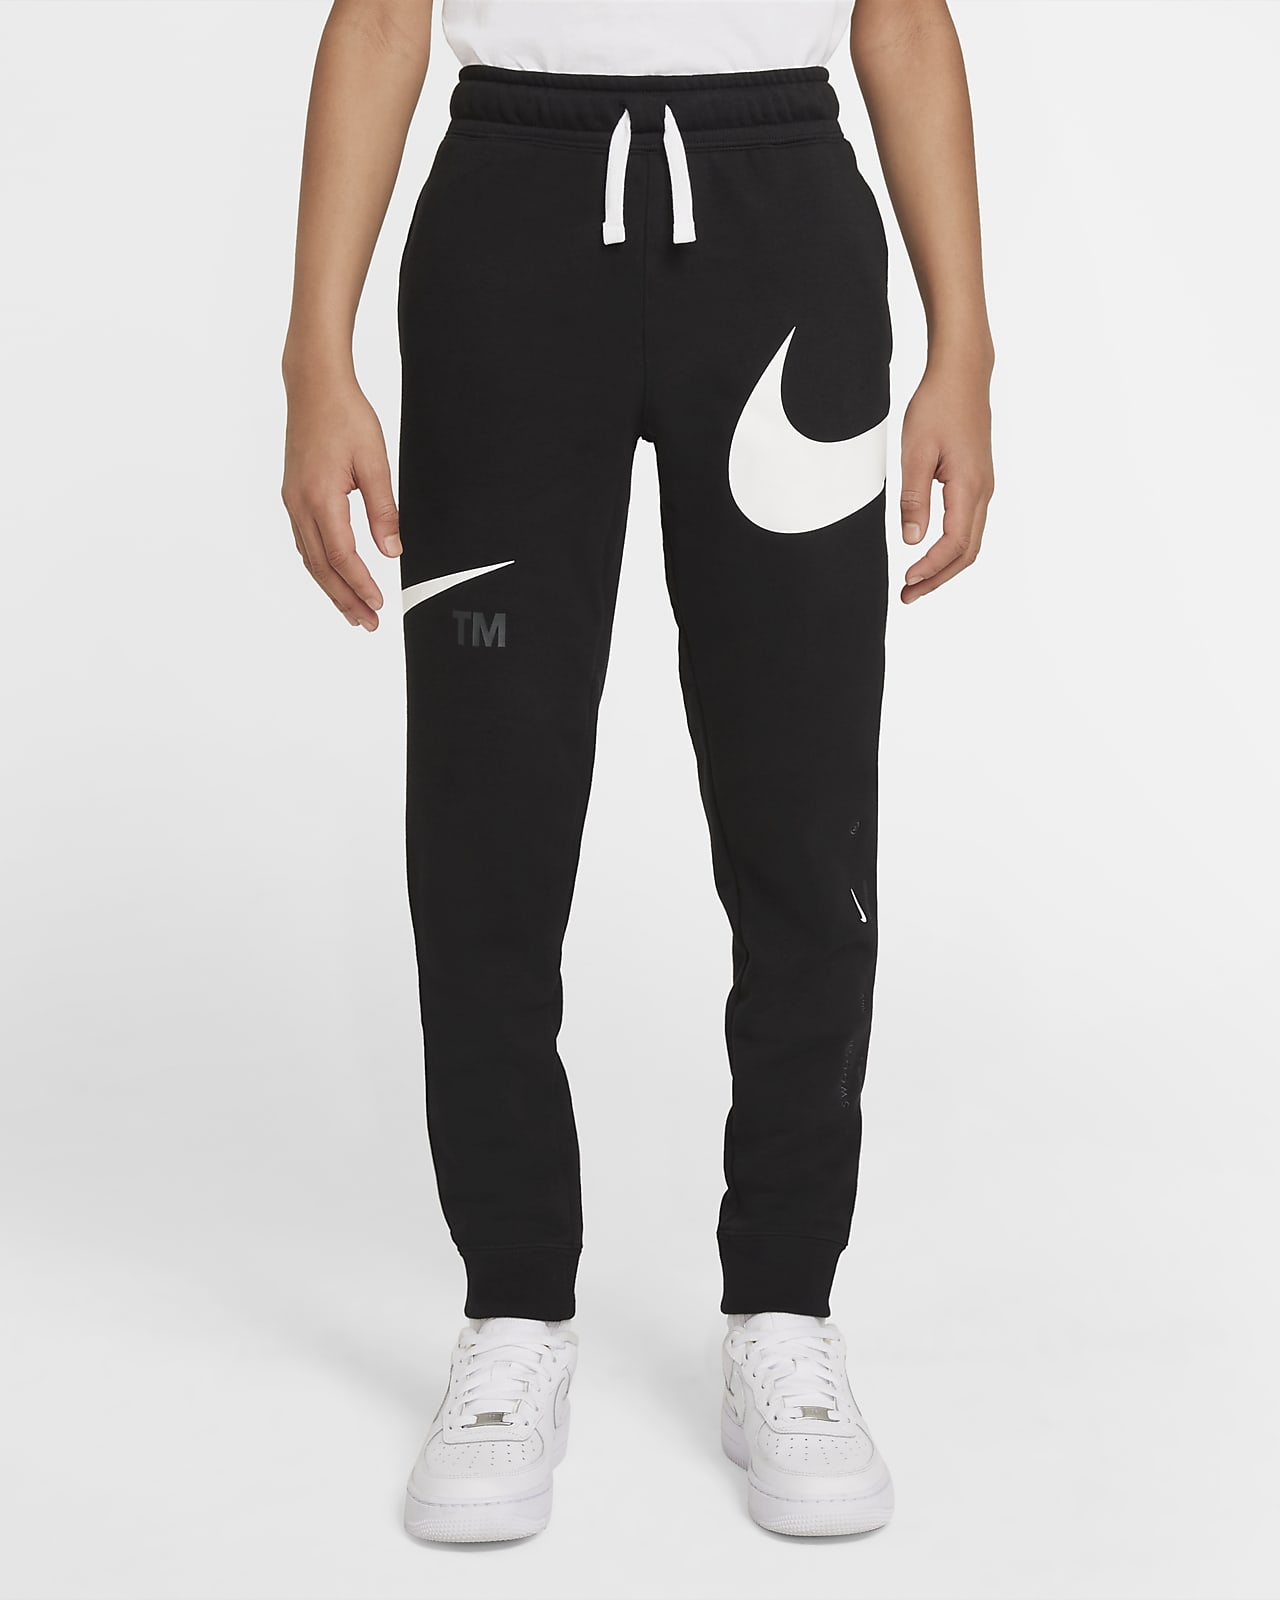 Calças de lã cardada Nike Sportswear Swoosh Júnior (Rapaz)